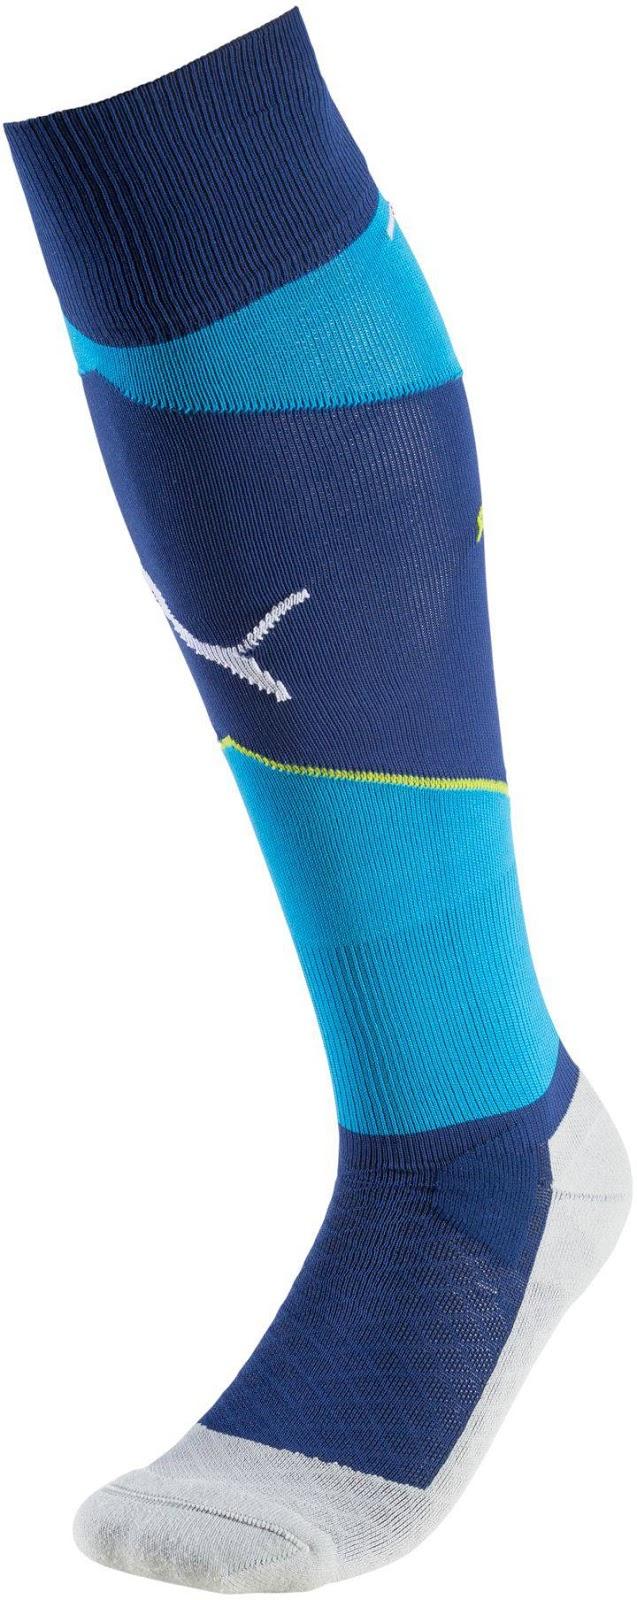 e14a7771418 arsenal third kit socks on sale   OFF50% Discounts